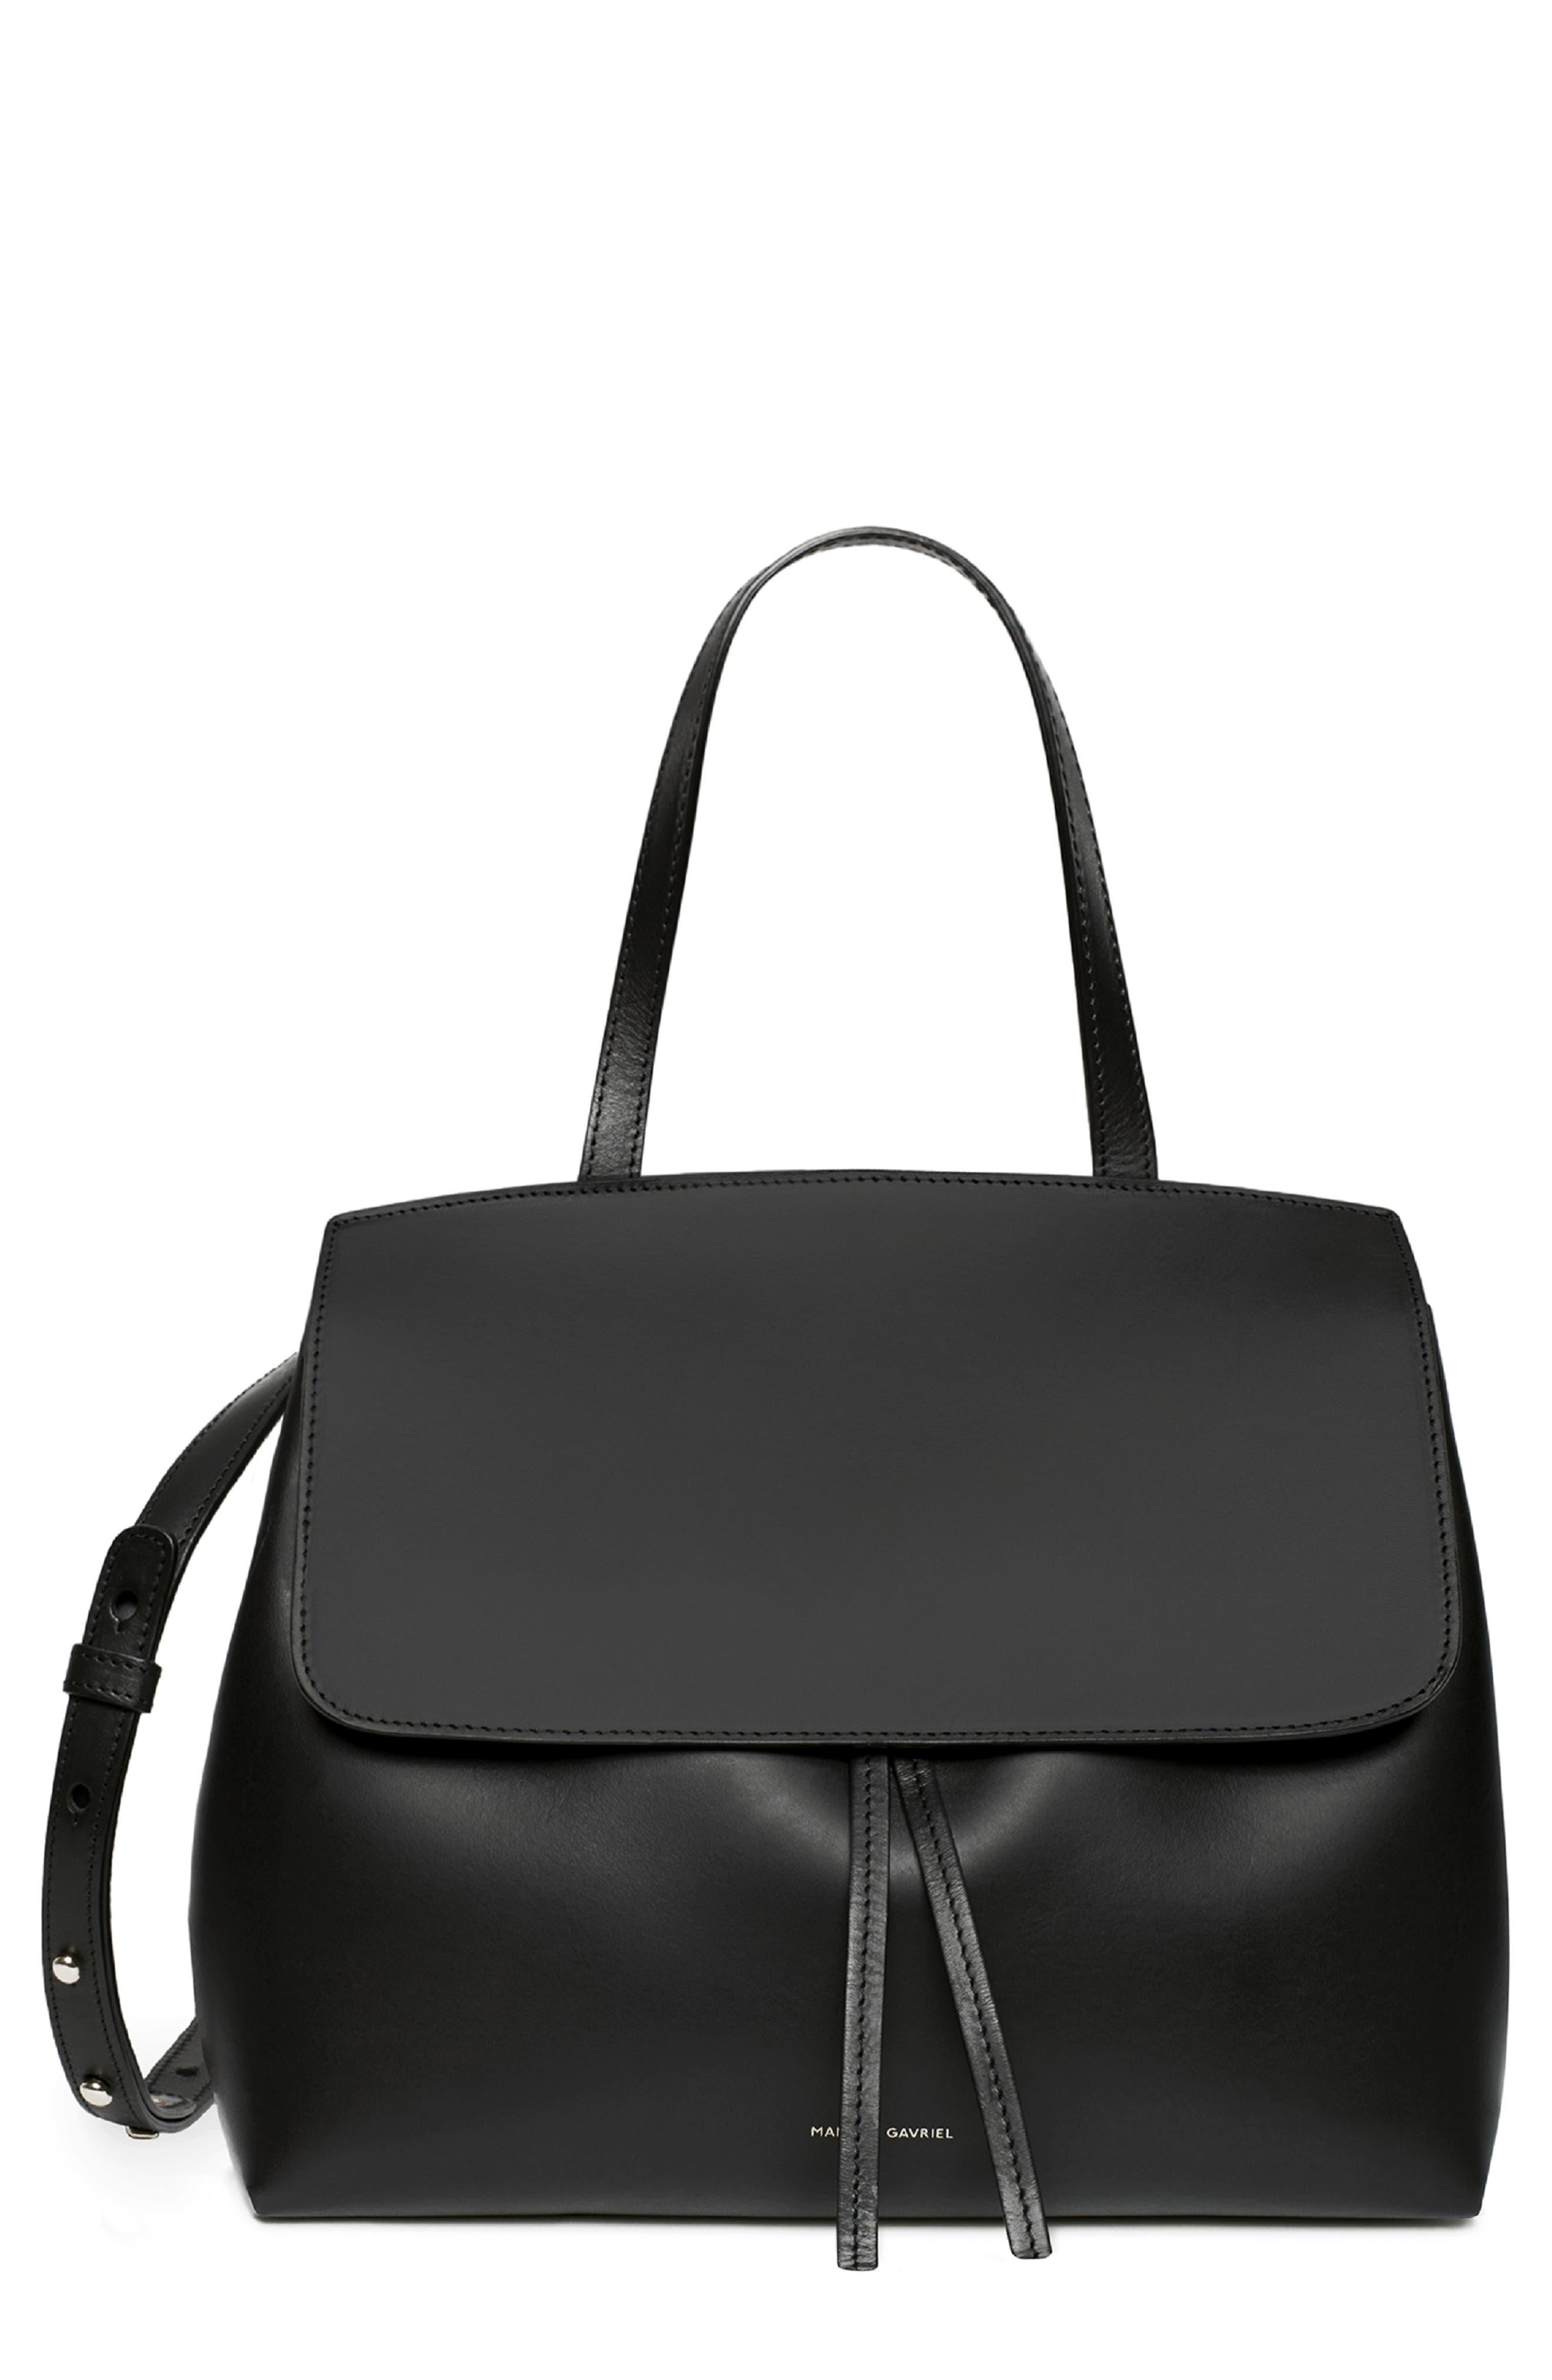 Mini Lady Leather Bag,                             Main thumbnail 1, color,                             BLACK/ FLAMMA